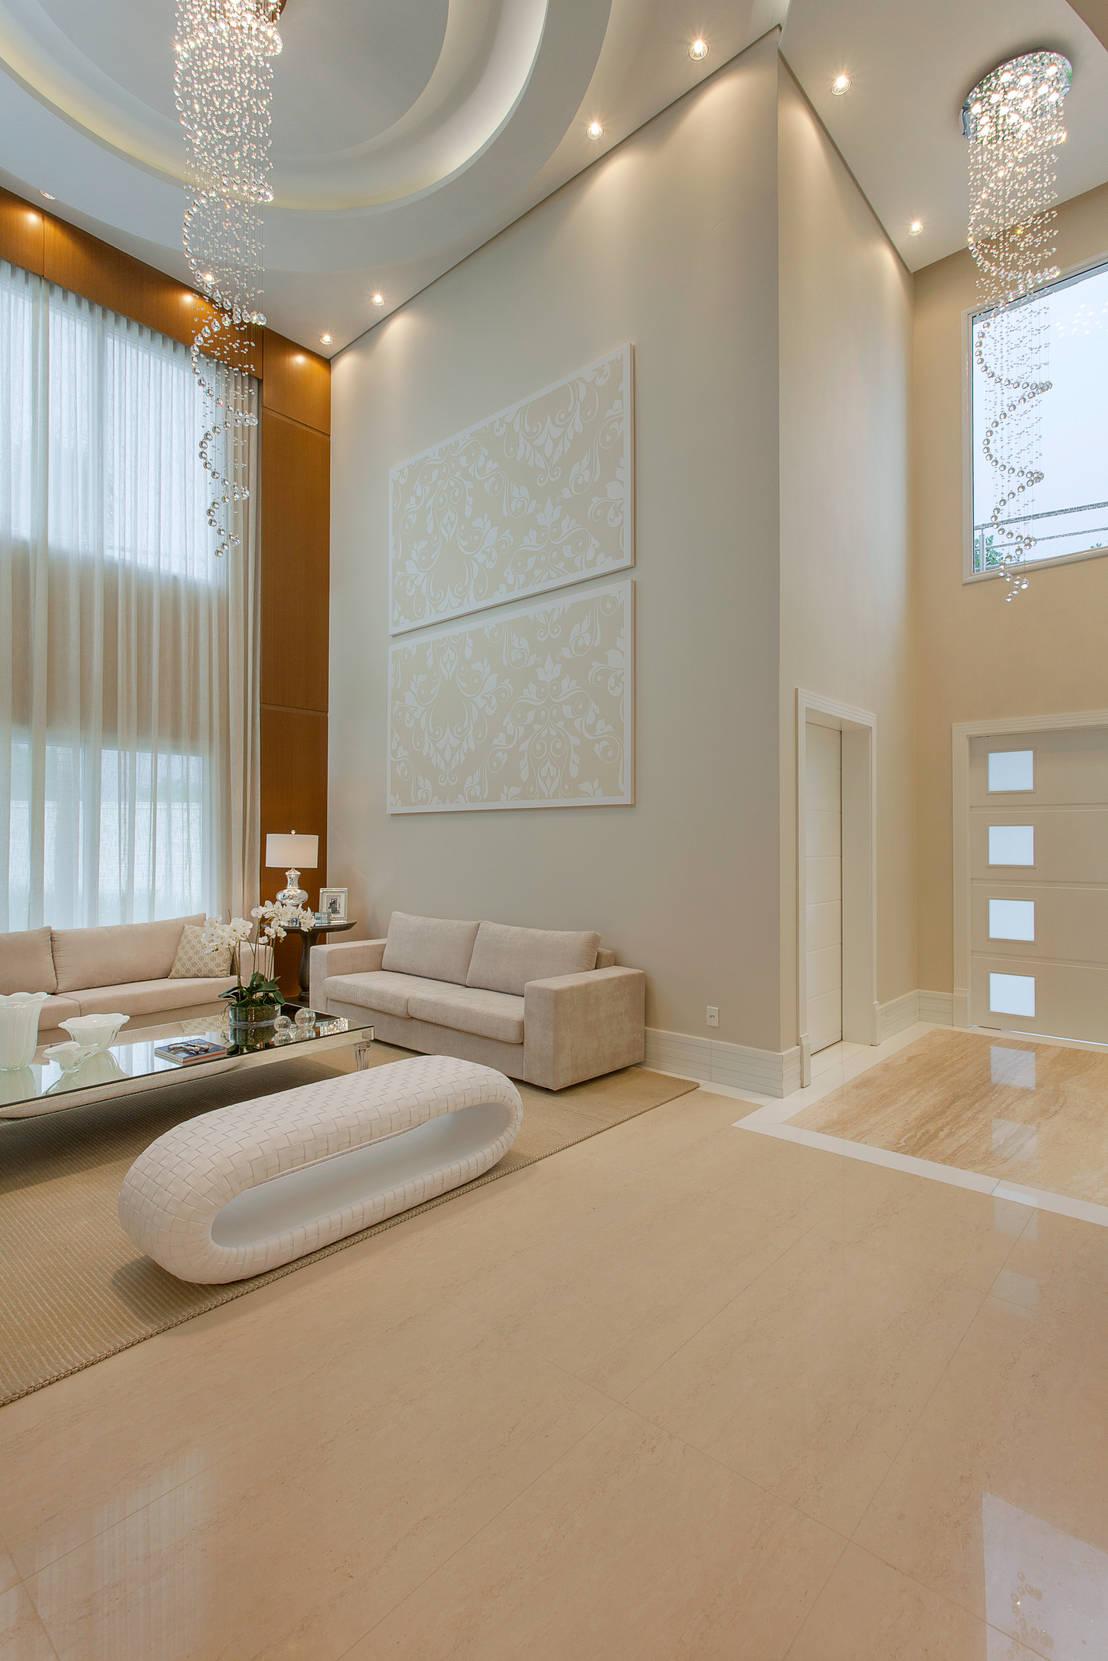 Casa indaiatuba por designer de interiores e paisagista for Casa designer